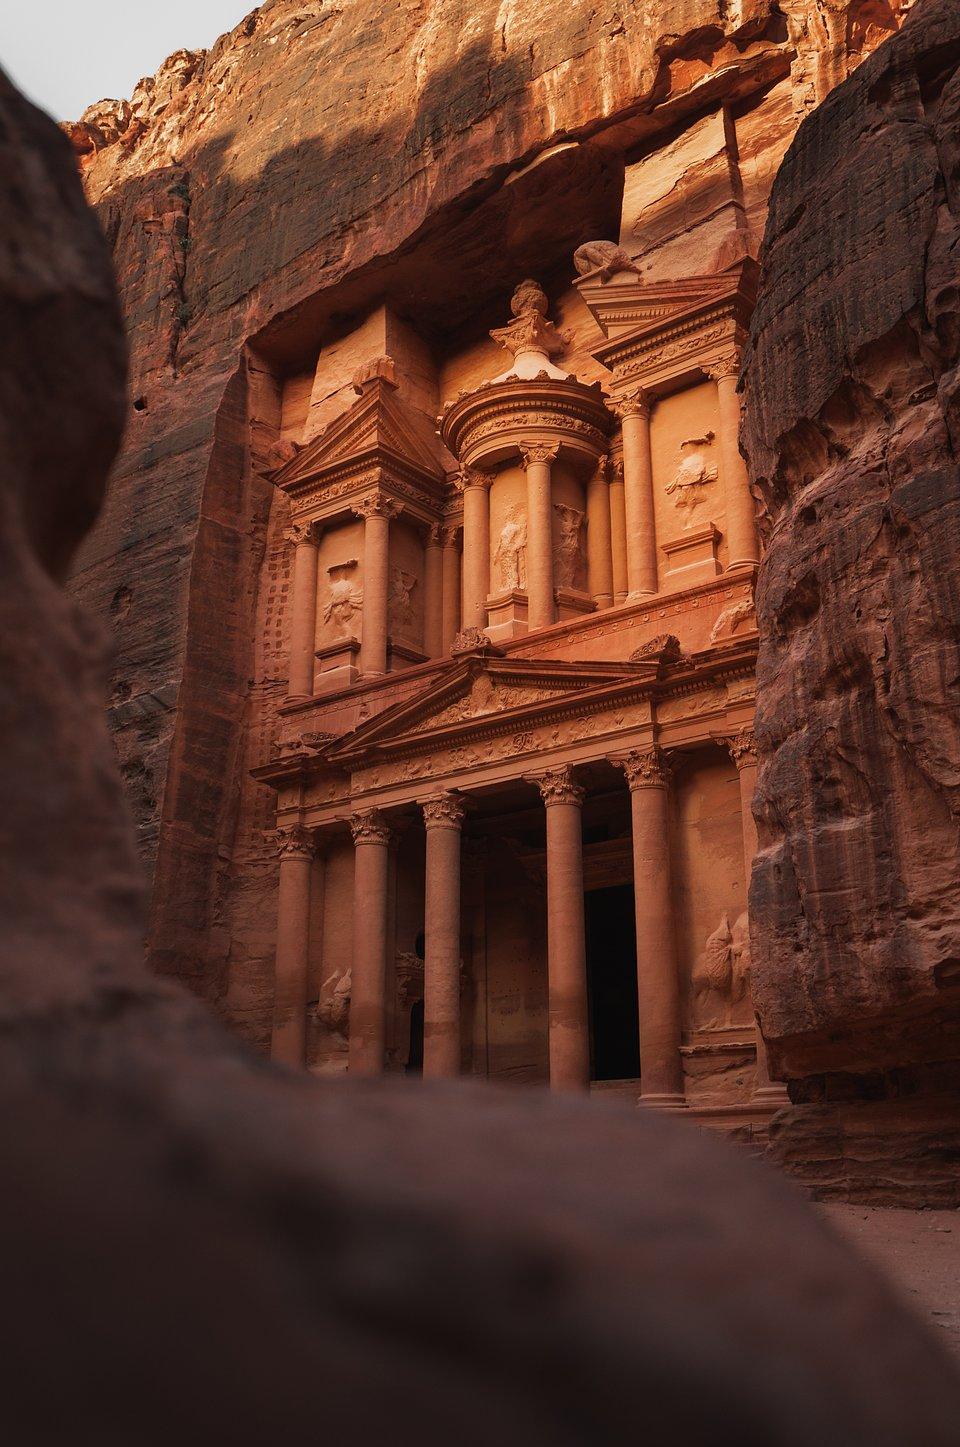 Location: Petra, Jordania